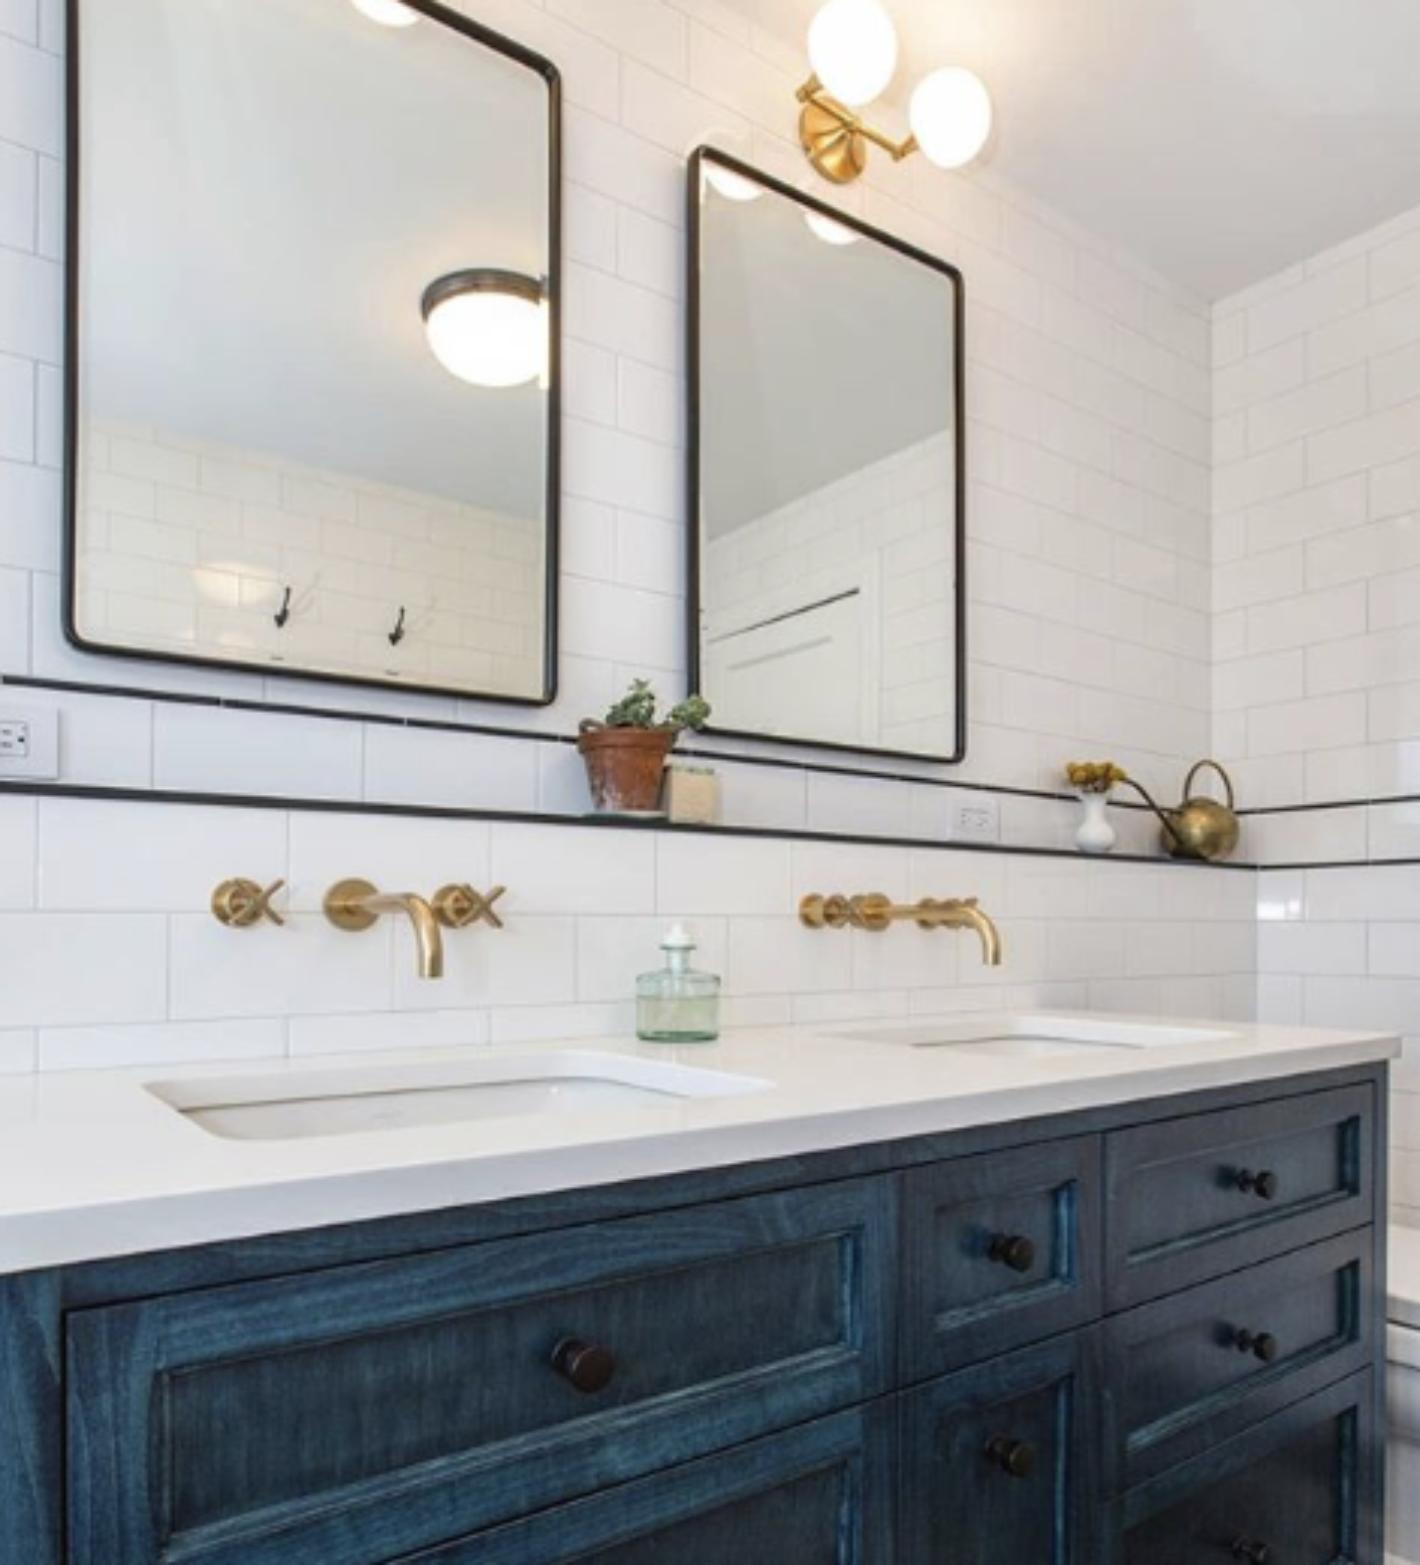 15 modern wall mounted faucet design